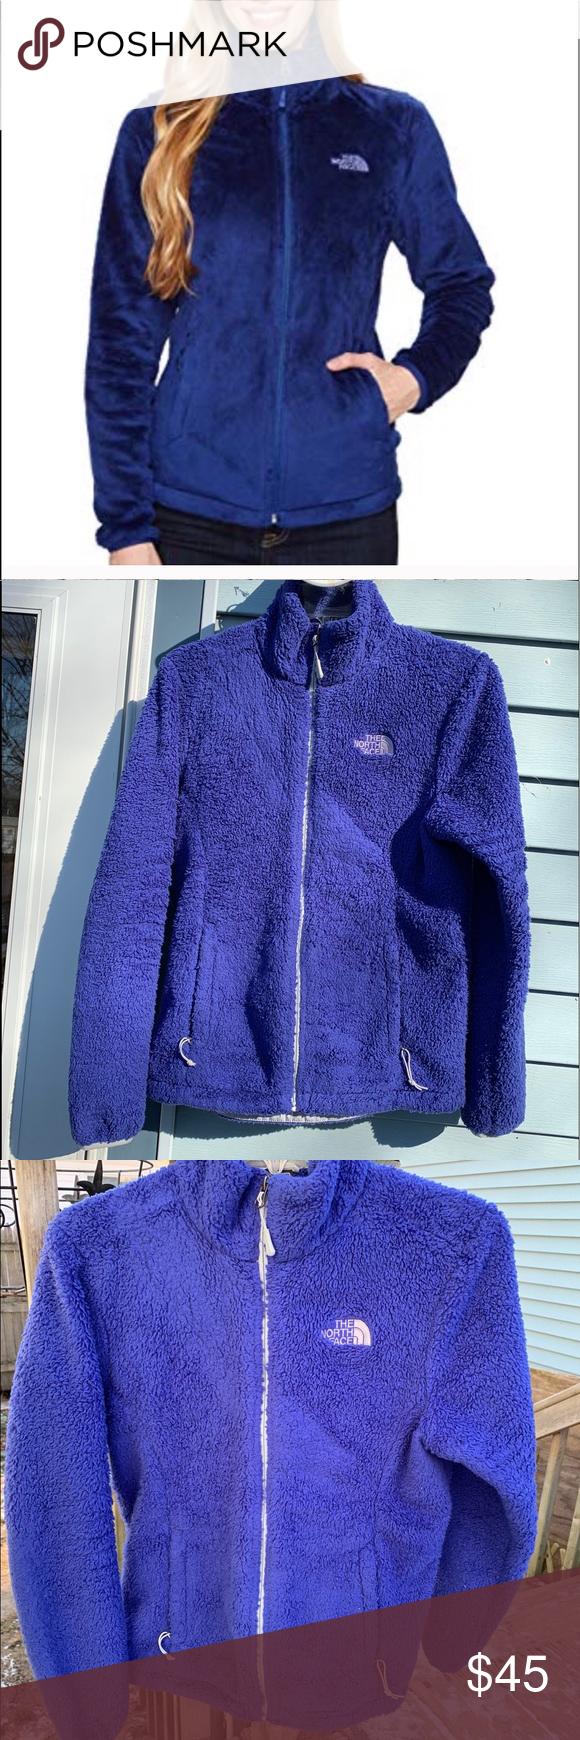 The North Face Osito Fleece Jacket Size Small Clothes Design Fleece Jacket Jackets [ 1740 x 580 Pixel ]